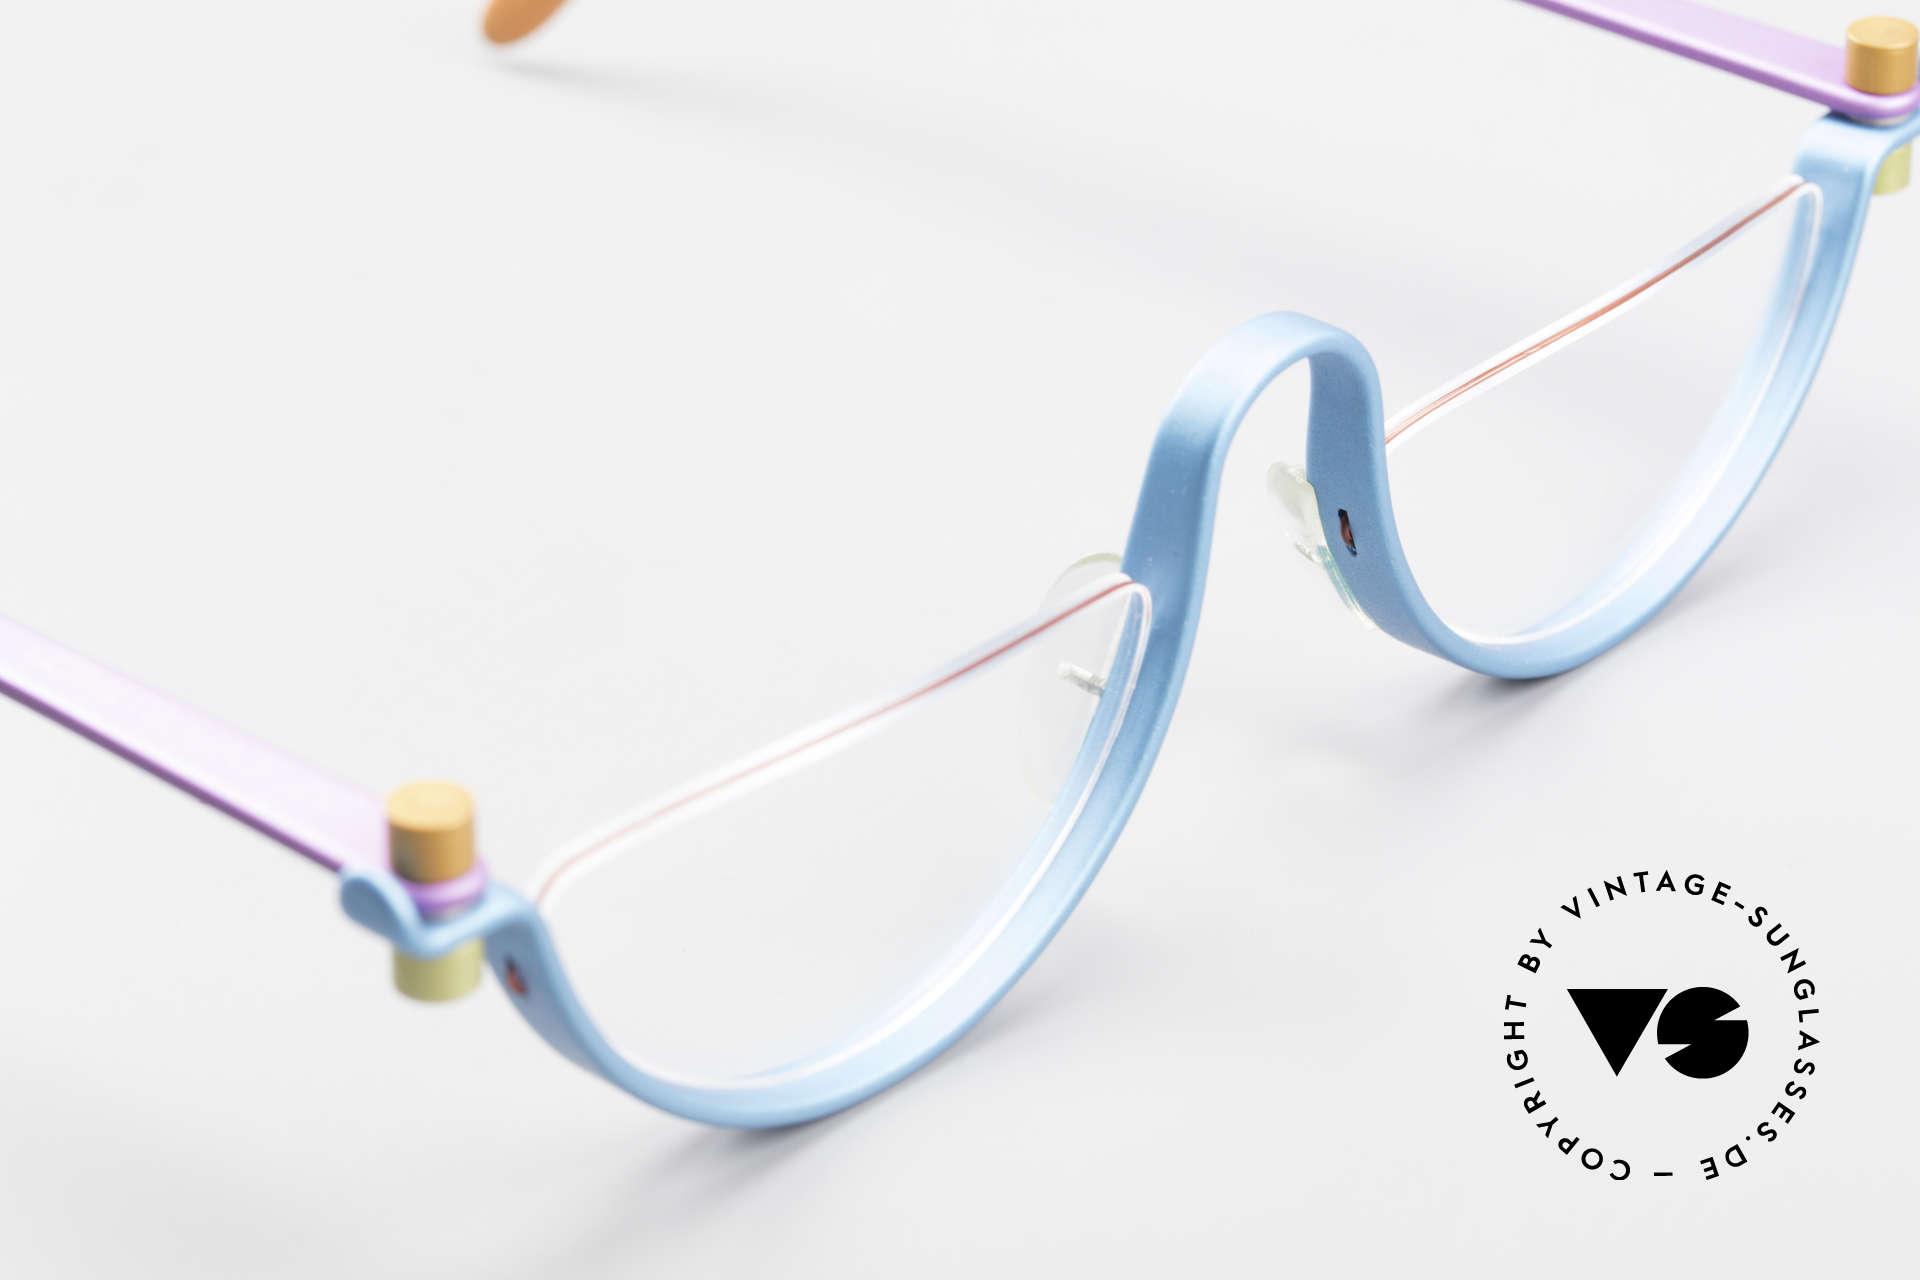 ProDesign No1 The Hunt For Red October 1990, ultra RARE designer reading eyeglasses from 1990, Made for Men and Women